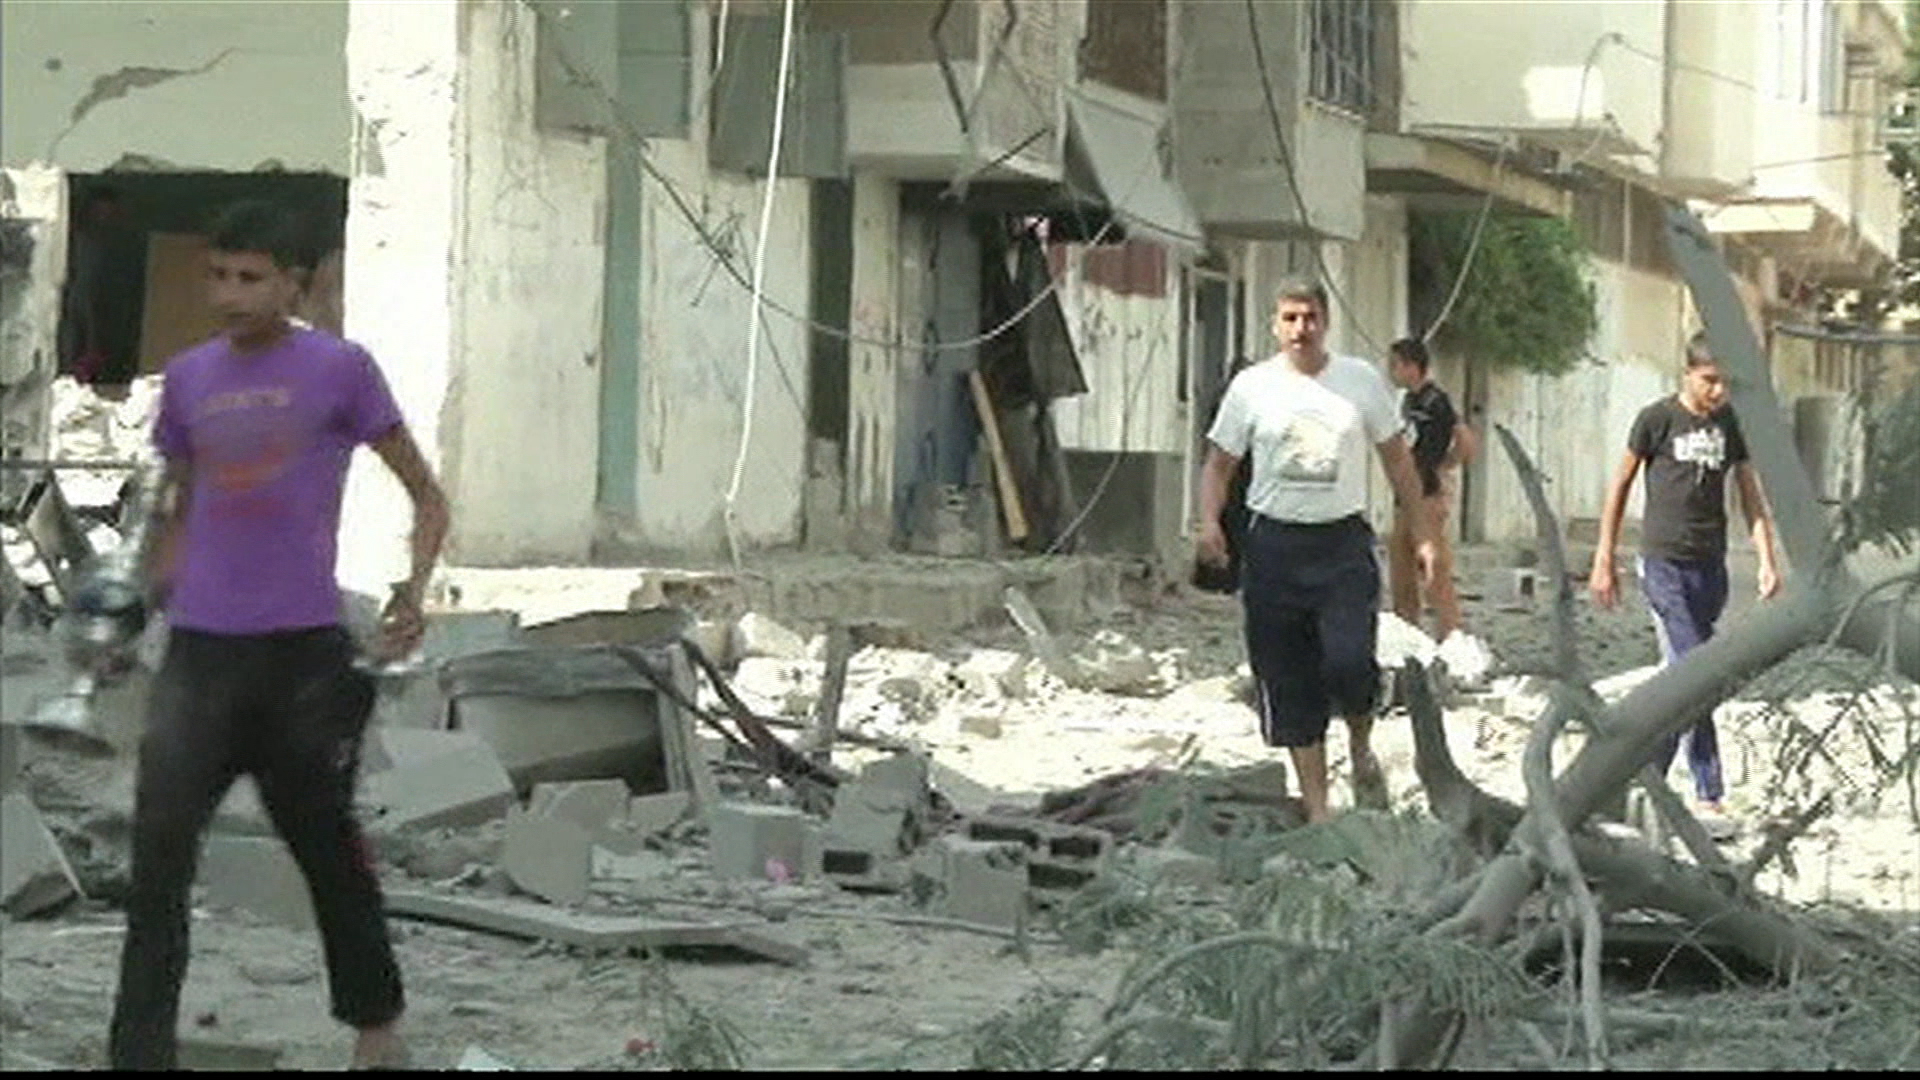 White House moves to calm Israel/Gaza strife